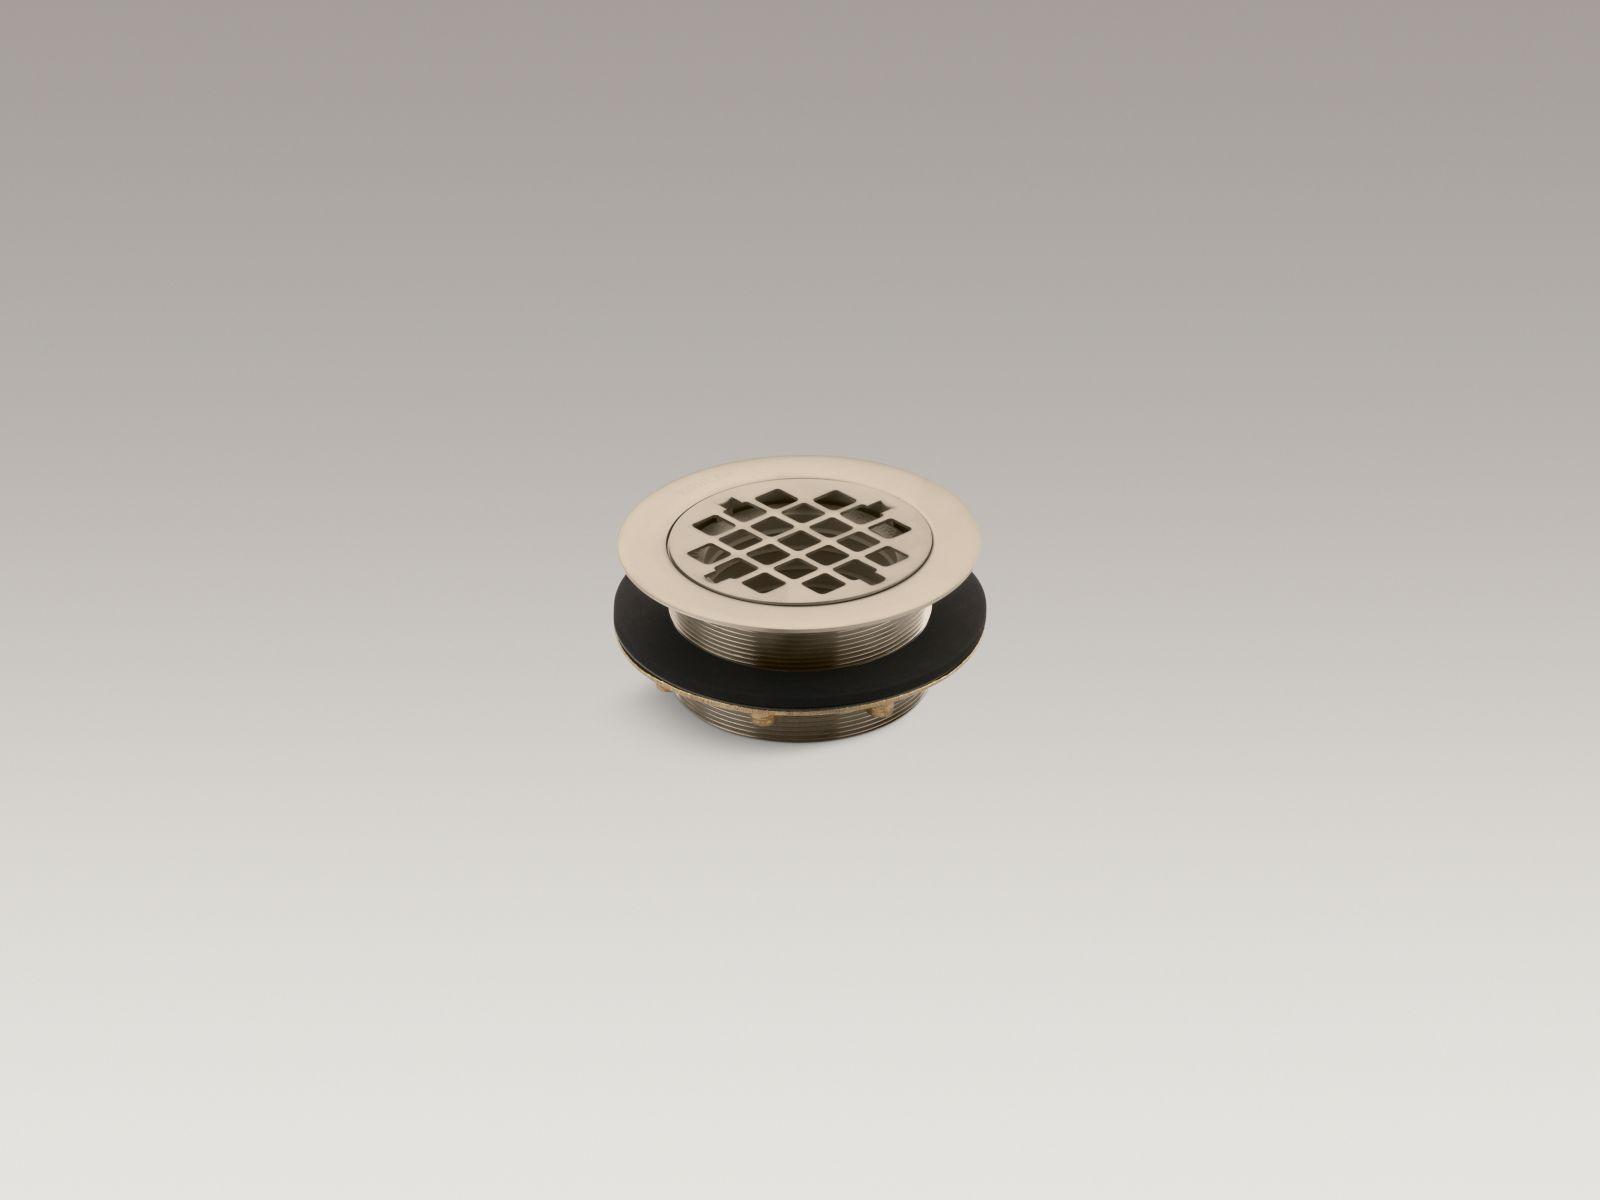 Kohler K-9132-BV Round Shower Base Drain with Plastic Pipe Gasket Vibrant Brushed Bronze